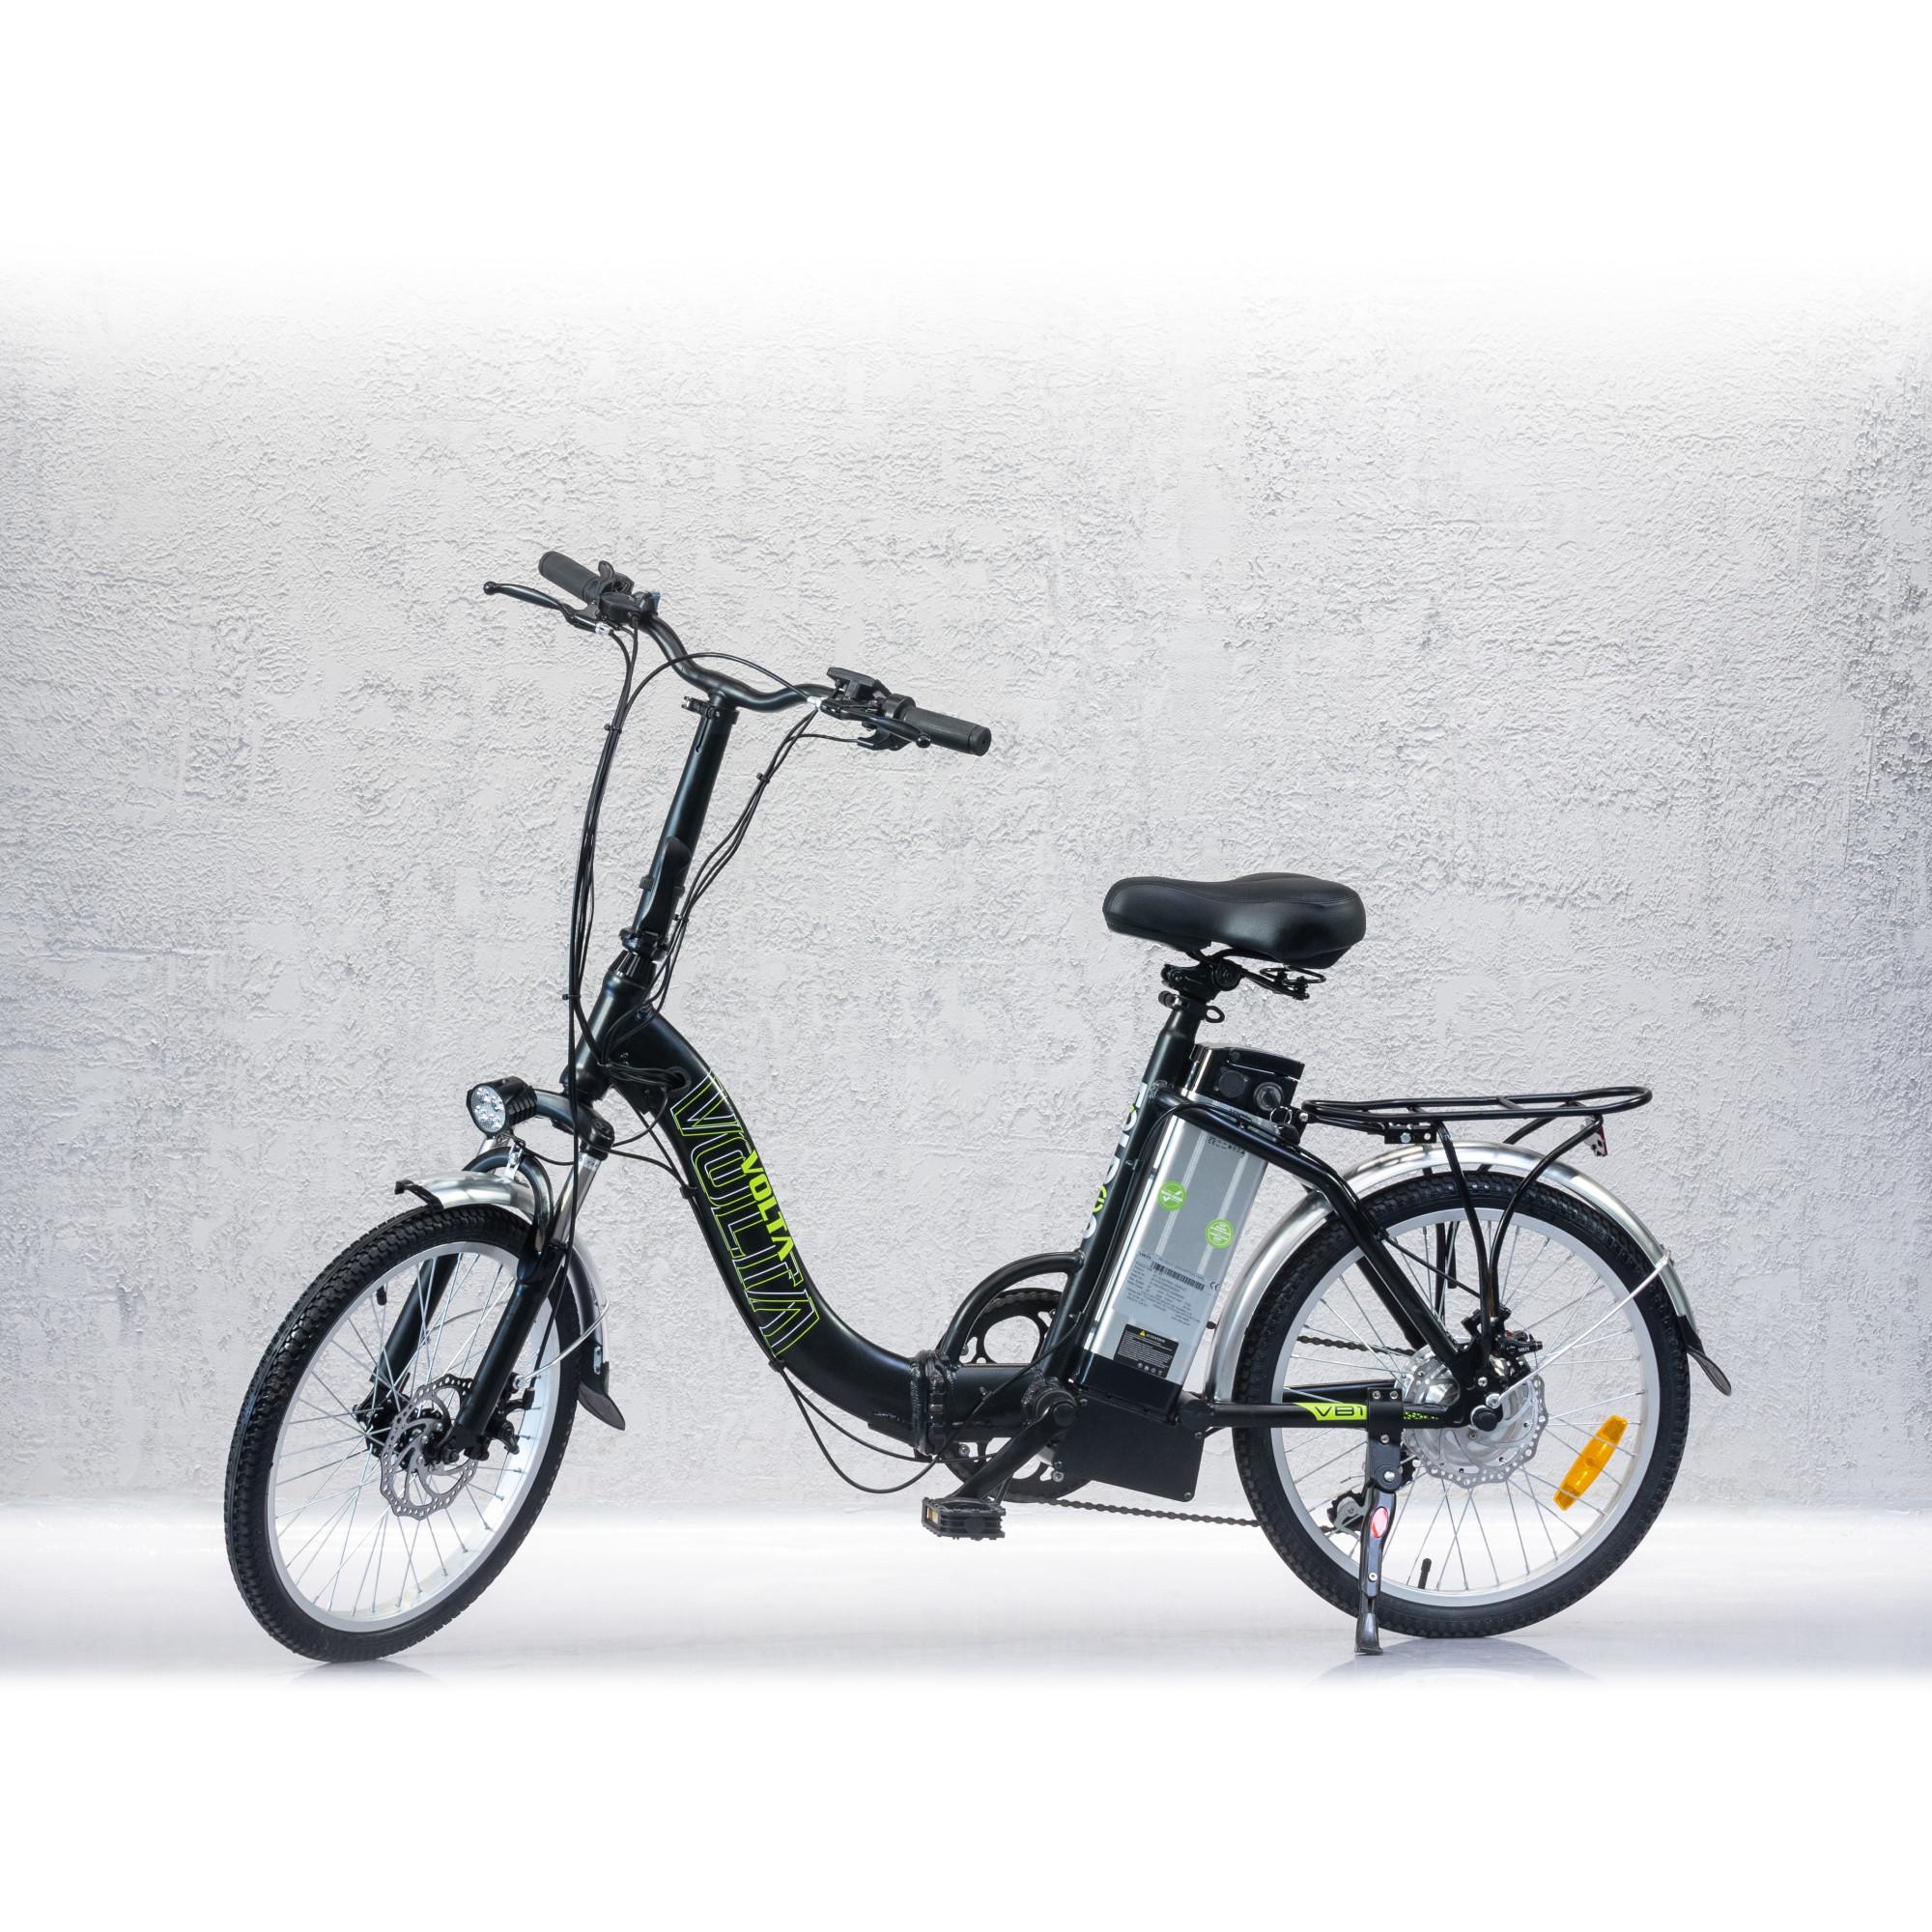 Bicicleta electrica pliabila VB1